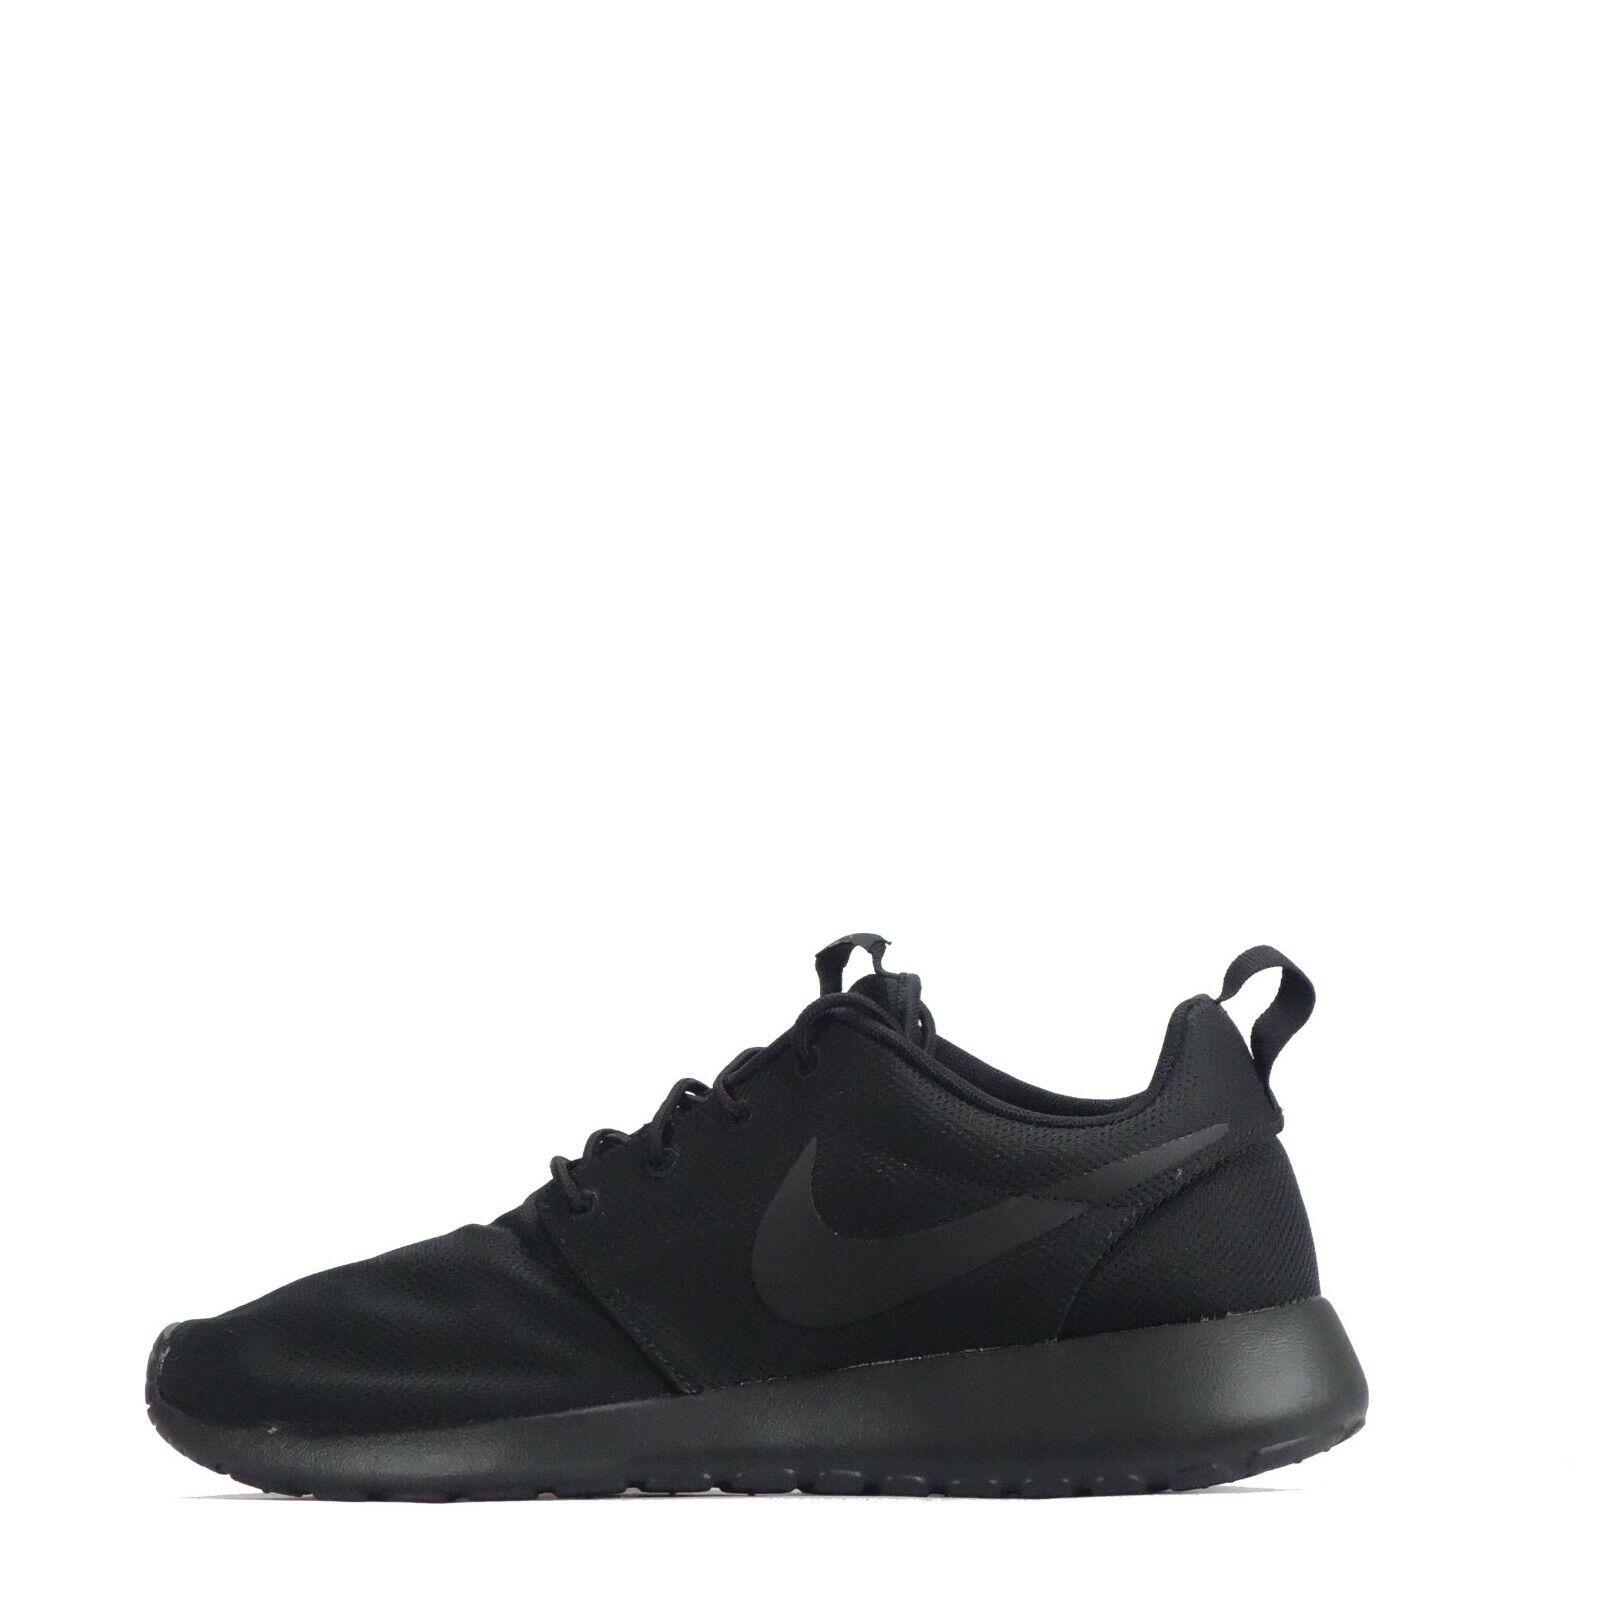 Nike Roshe Run Men's Trainers Triple Black  Odd Pair Pair Pair 5366bf